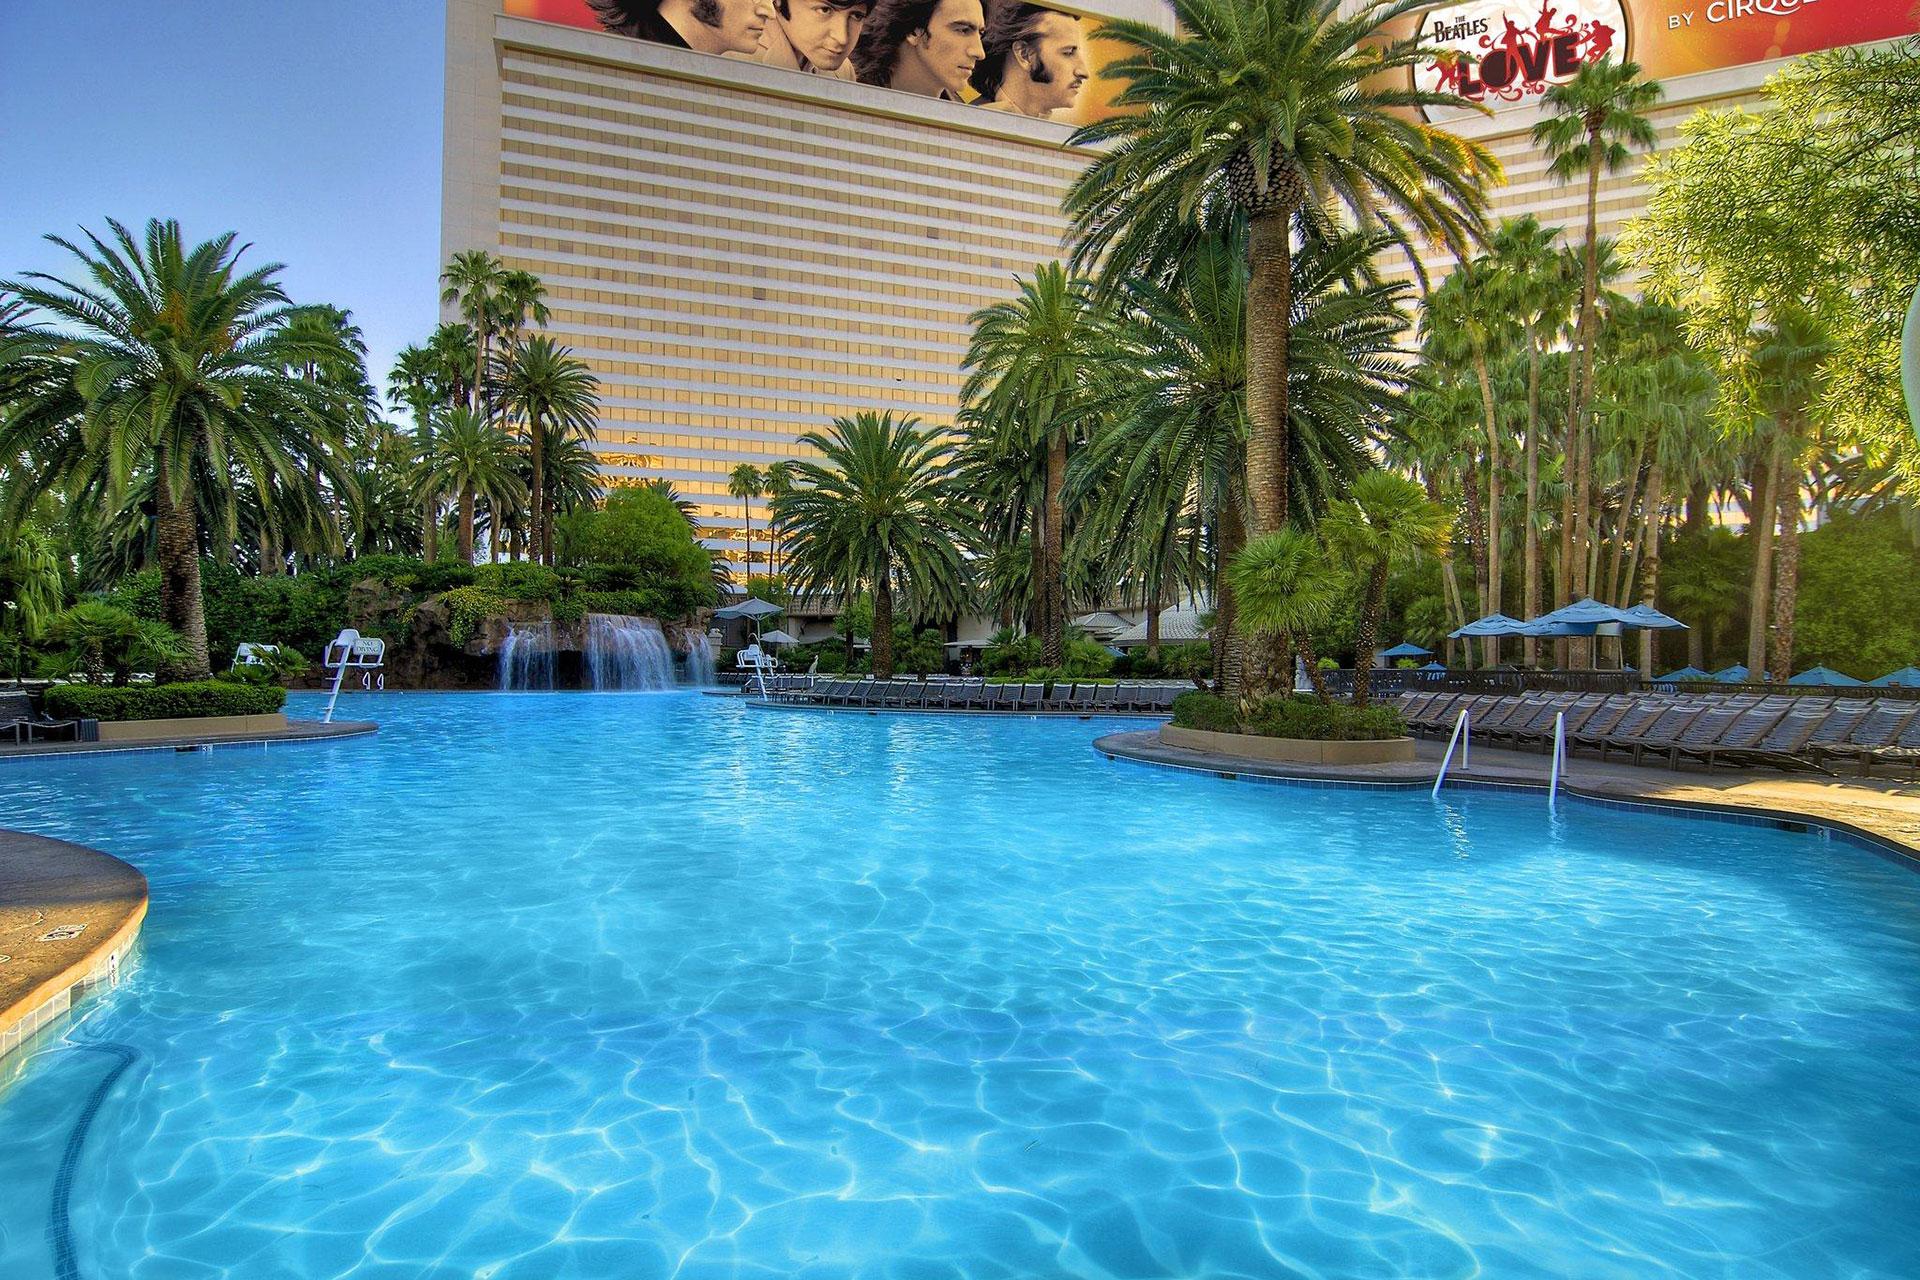 Pool at The Mirage Hotel & Casino in Las Vegas